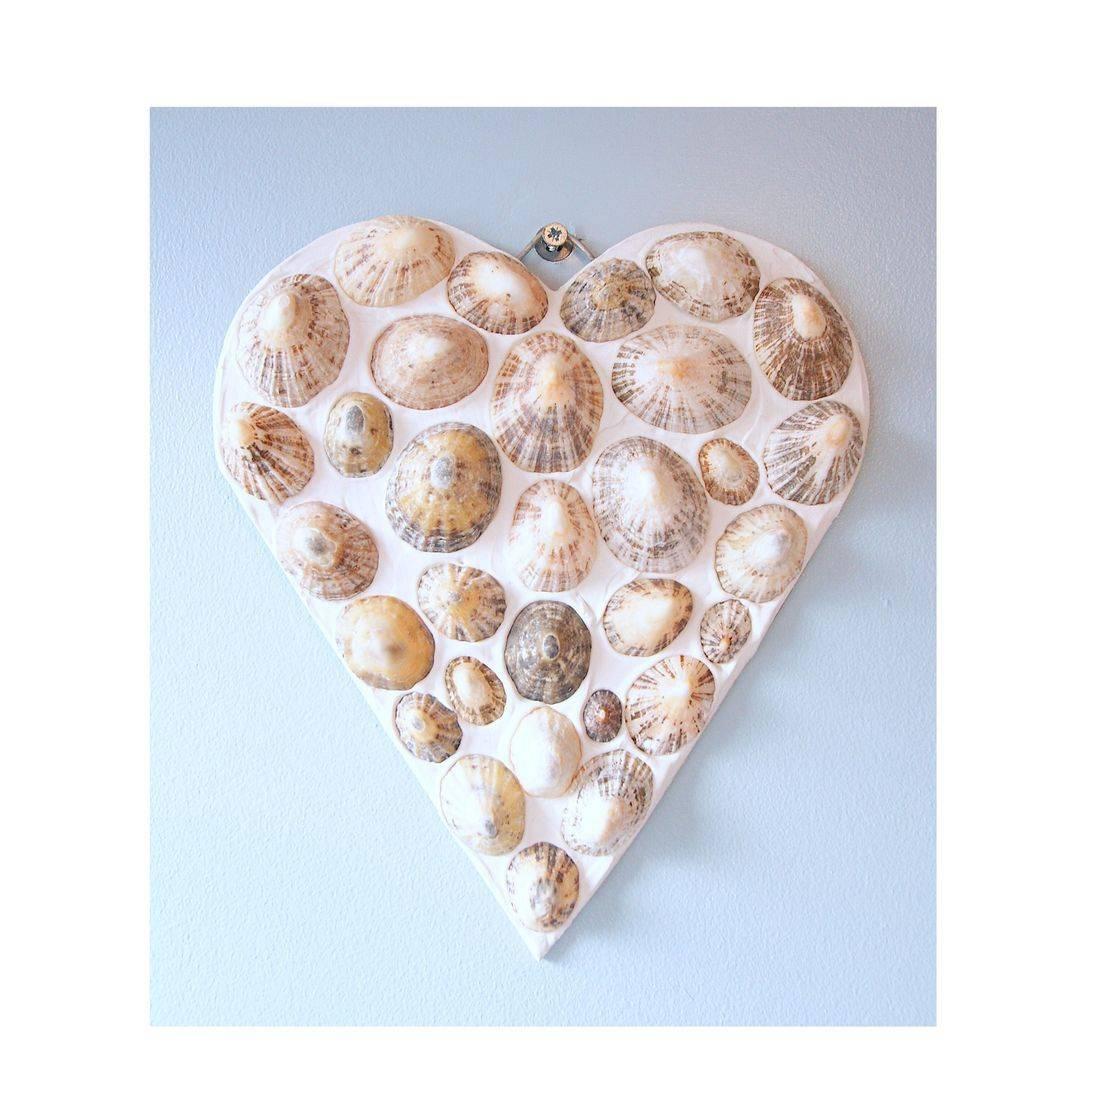 25 Mosaic Shell limpit heart